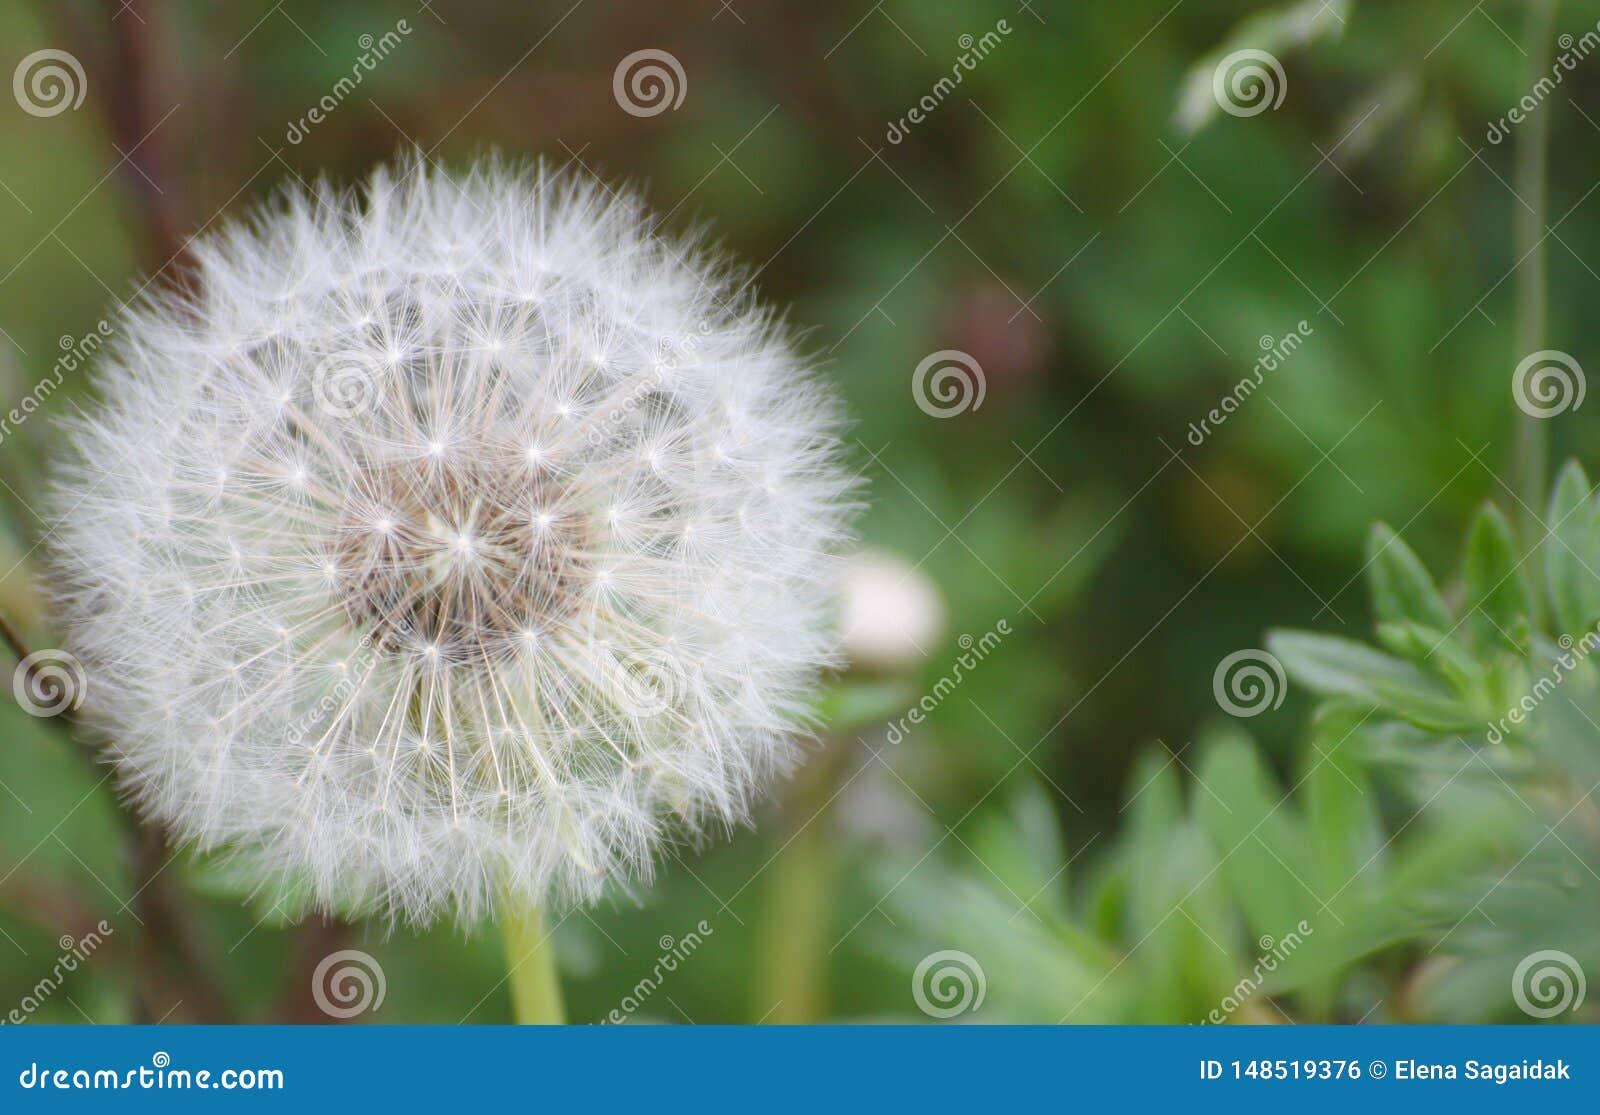 Big air dandelion background